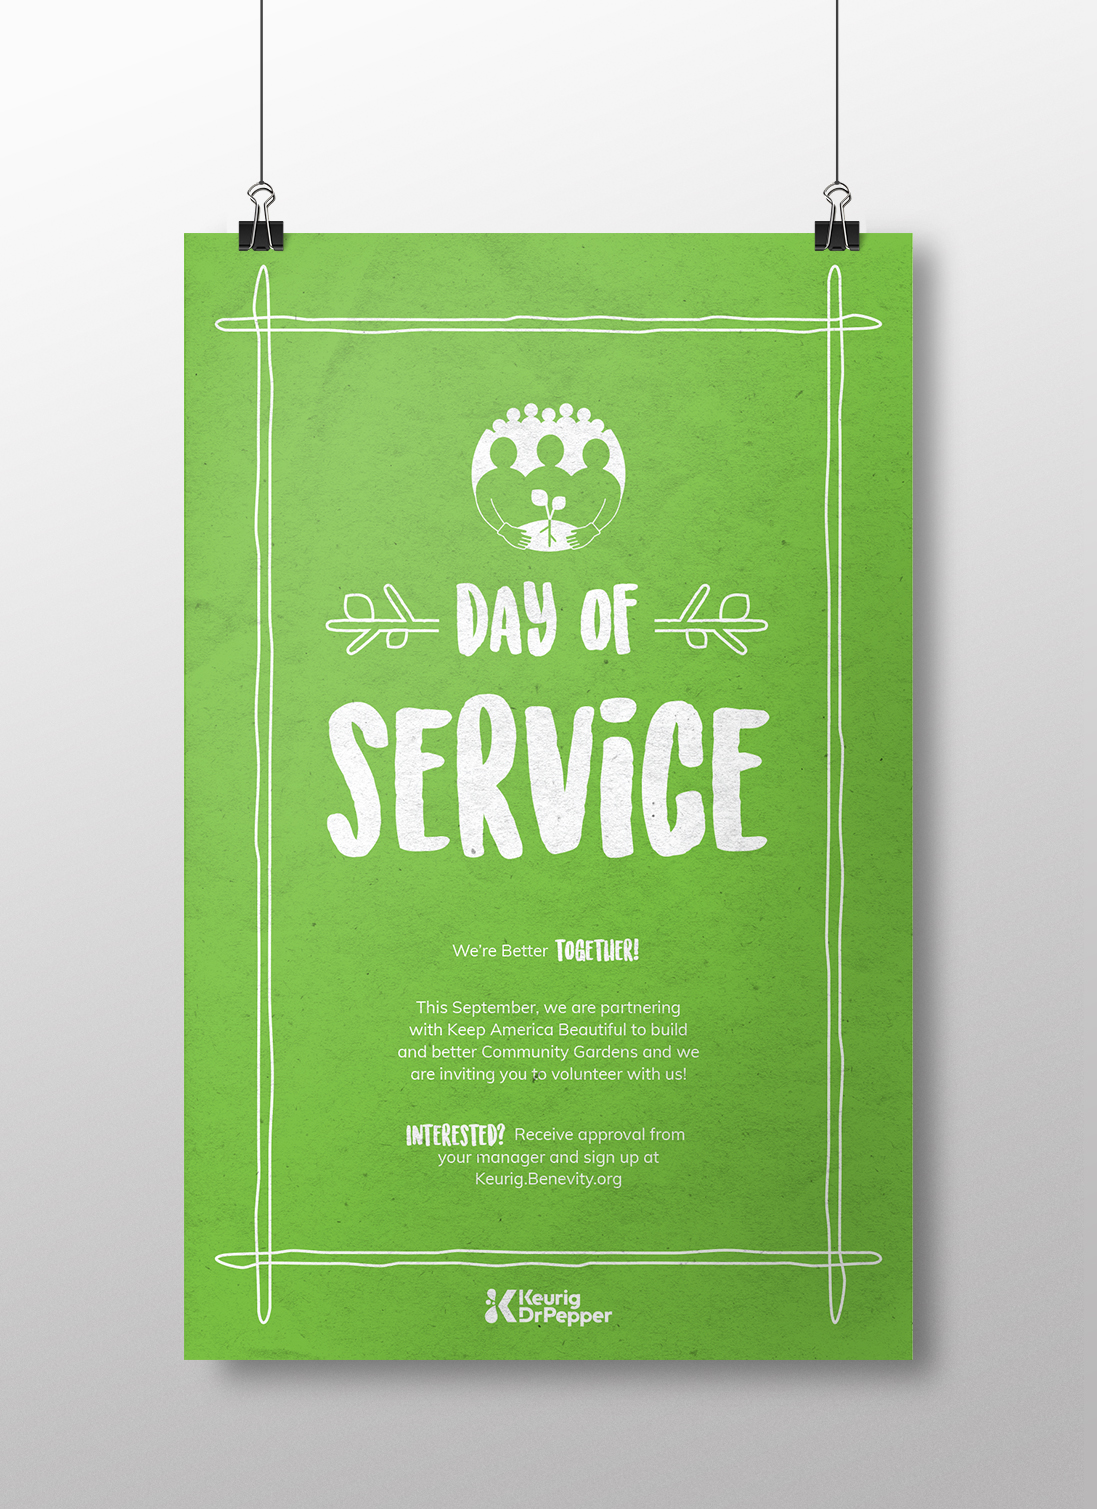 DayOfService_Poster_Mockup.jpg